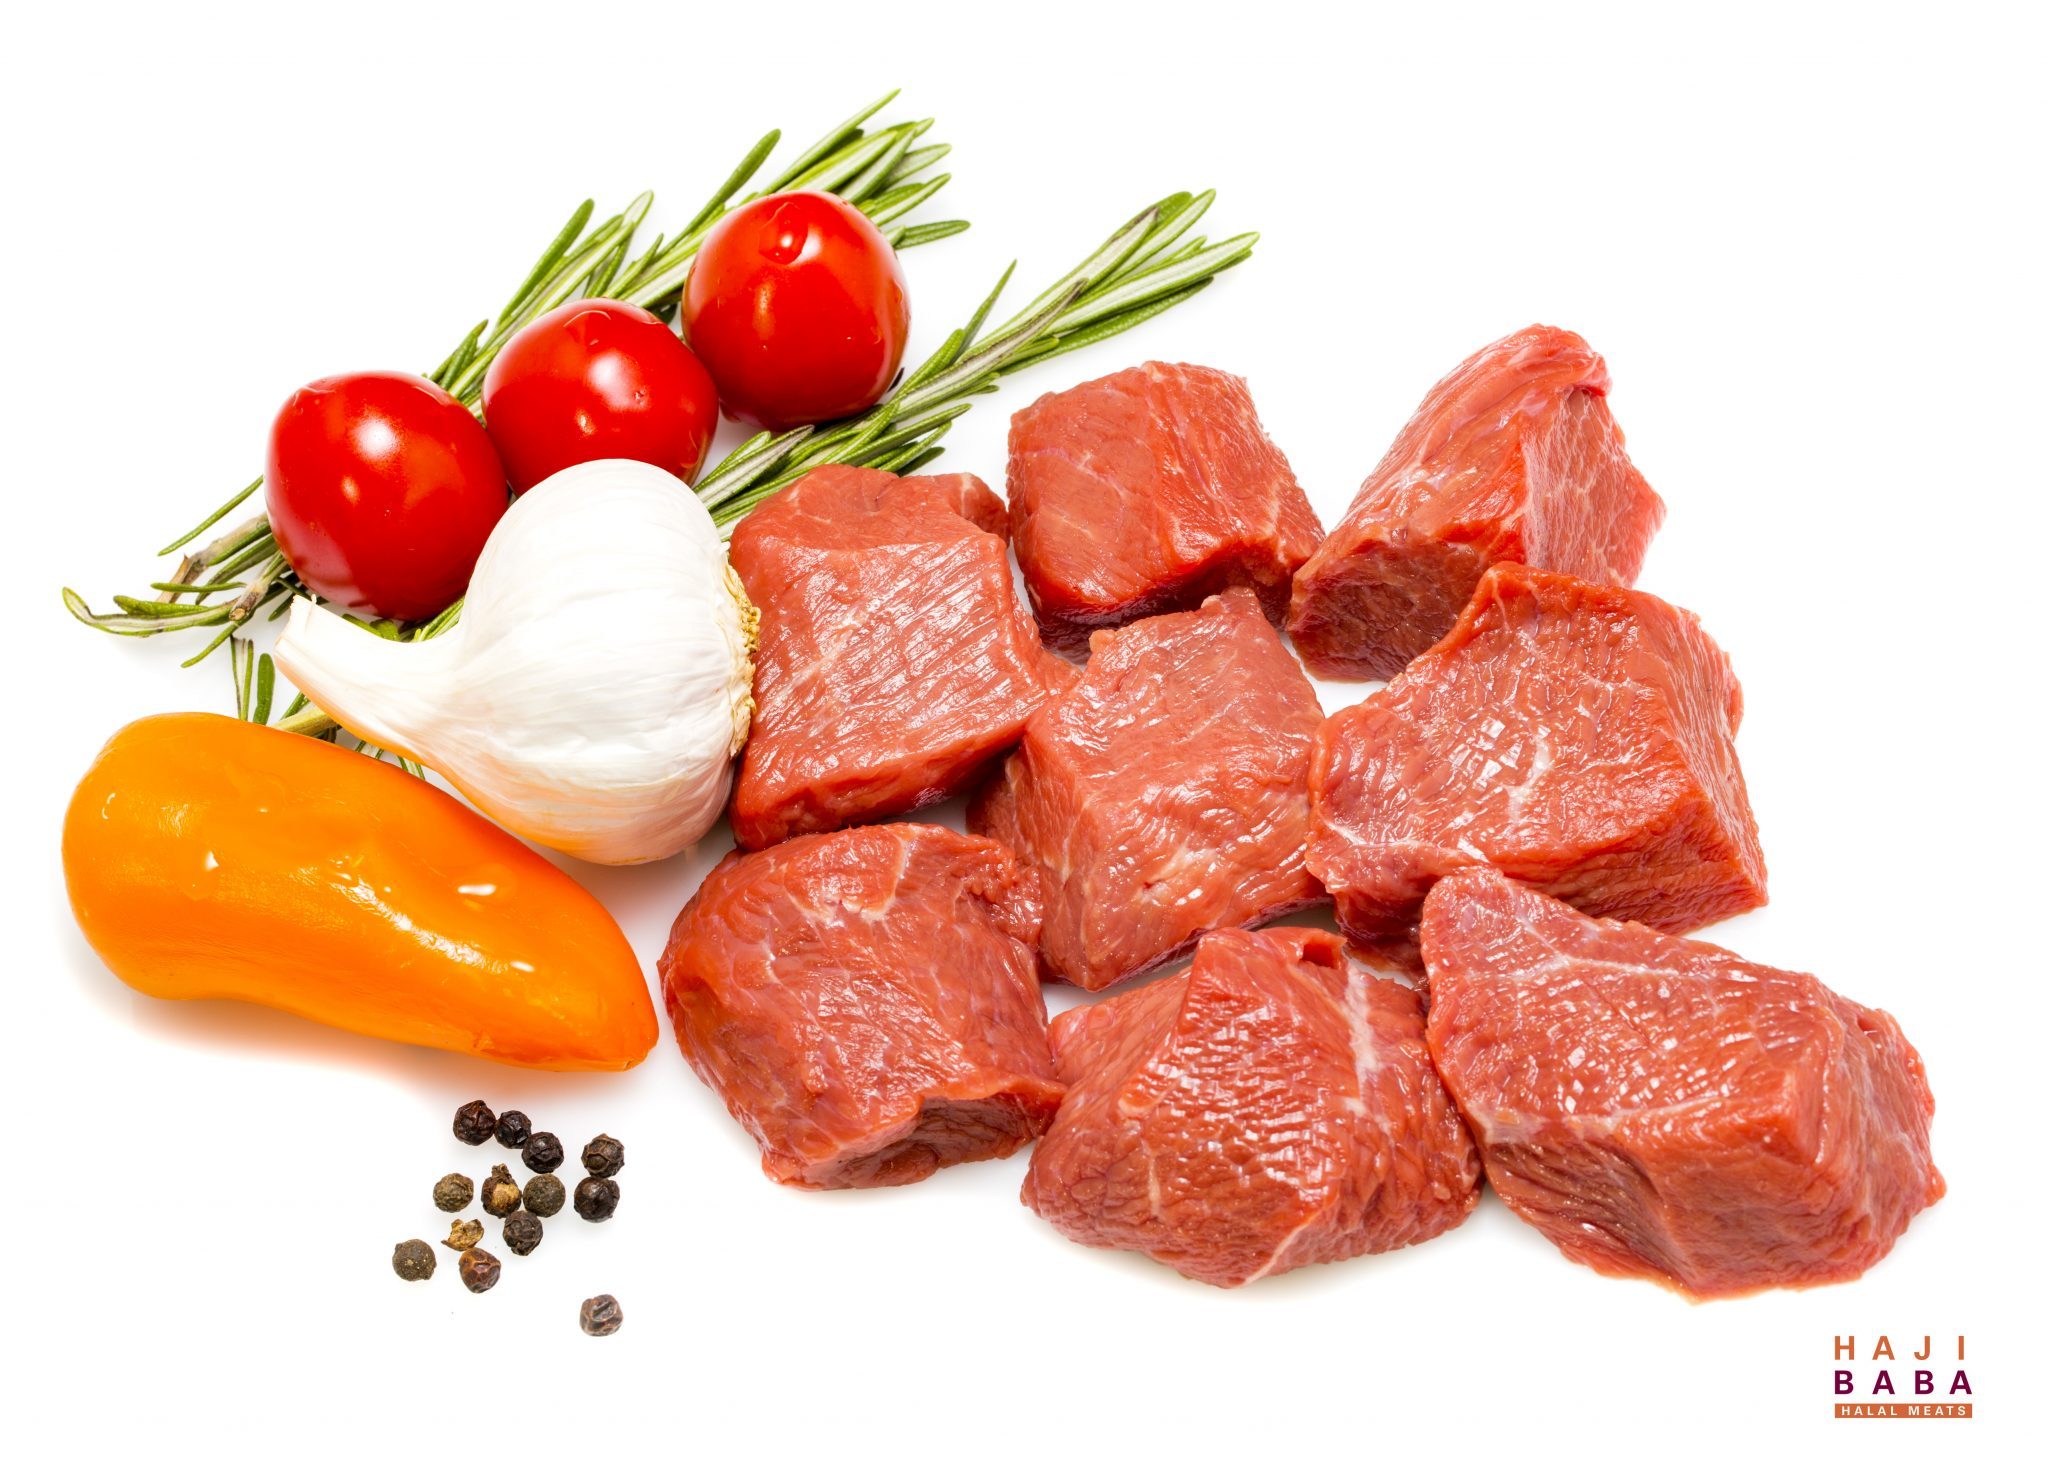 Halal Free Food